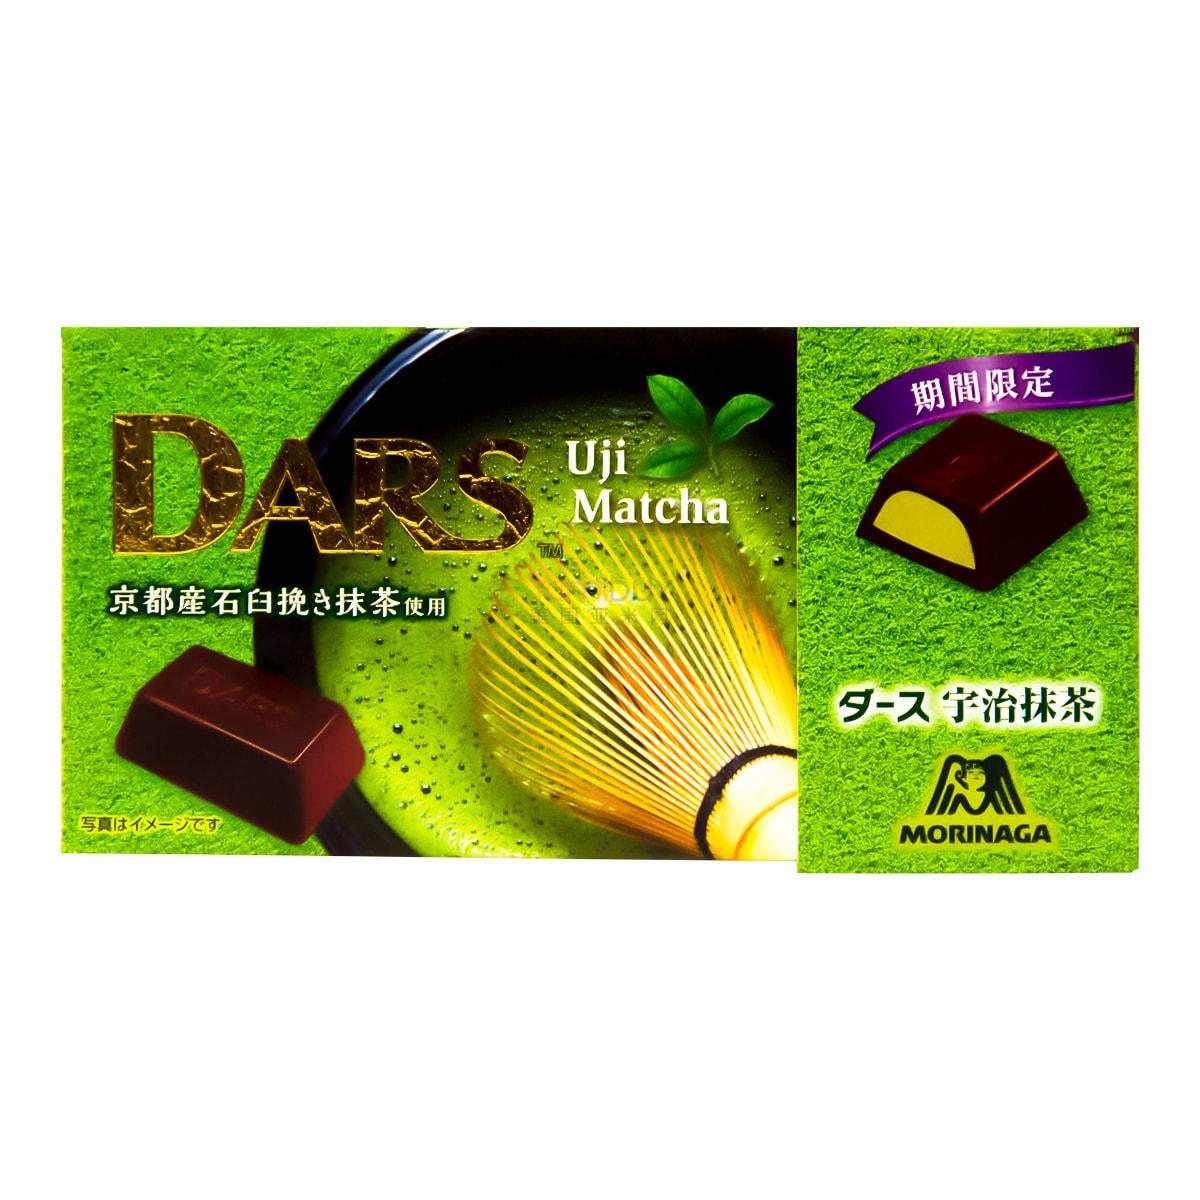 Uha Chocolate Milk Candy 103g Morinaga Dars Uji Matcha 44g